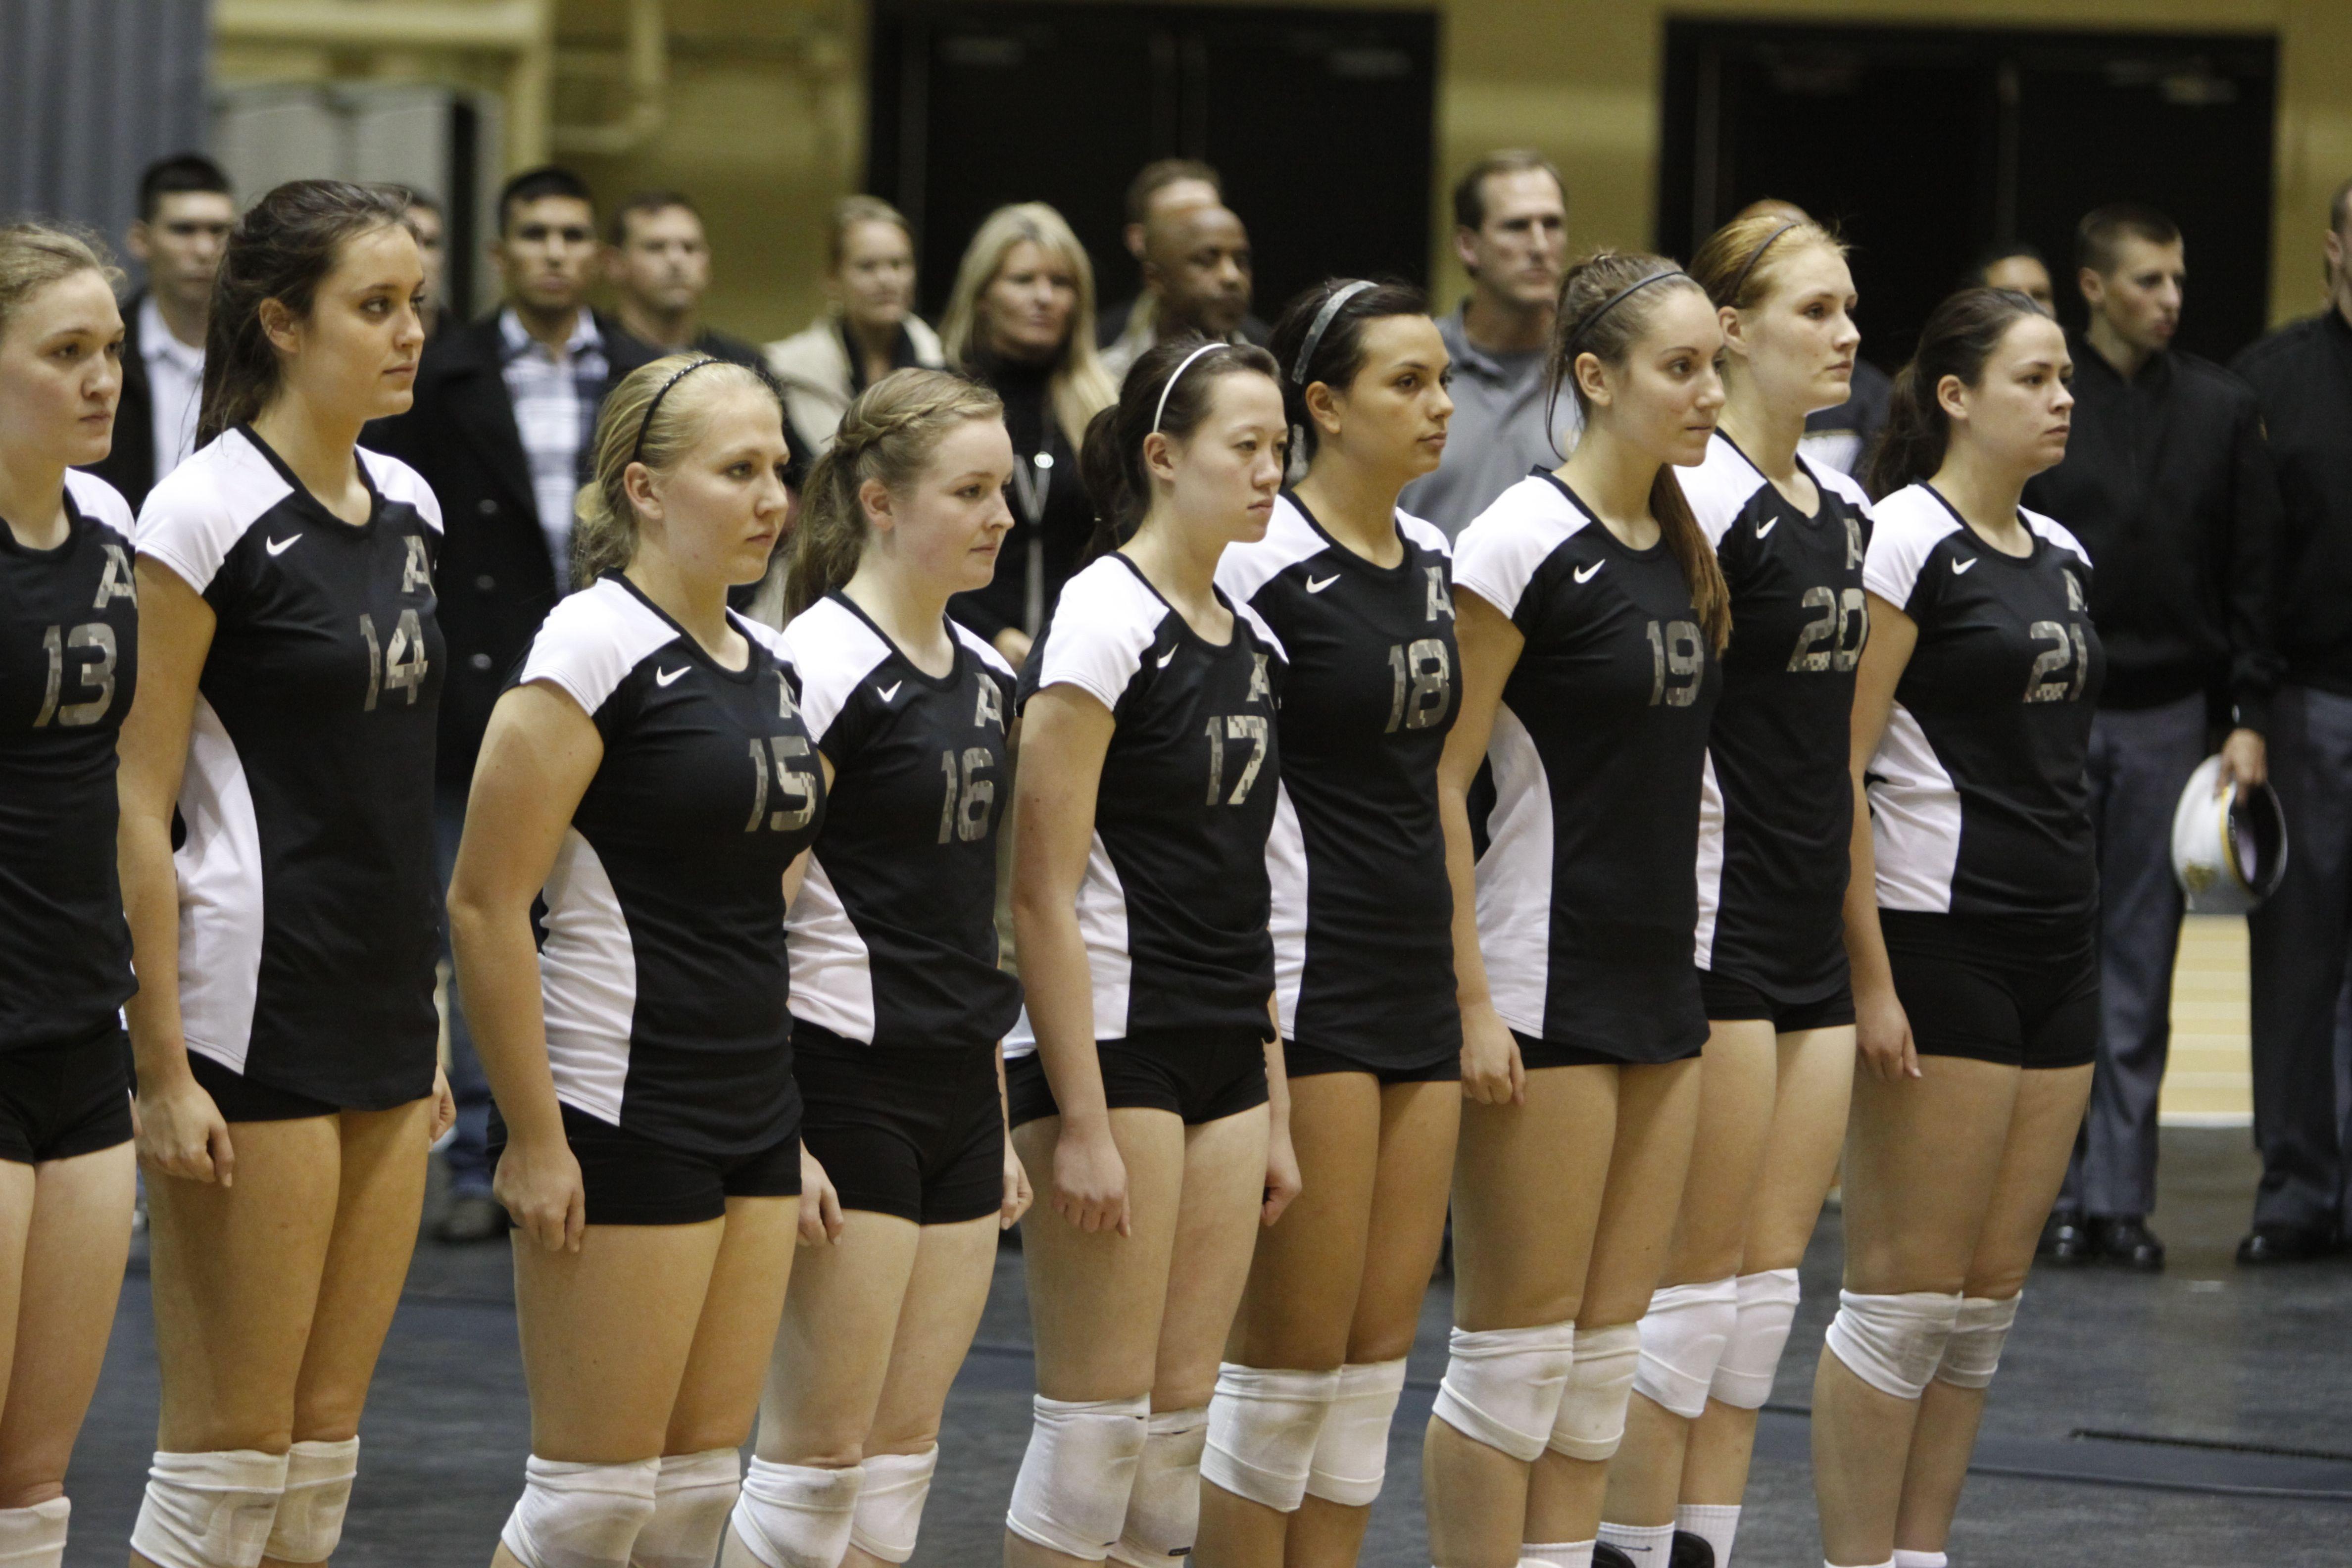 Army Volleyball Jersey Volleyball Jerseys Volleyball Jersey